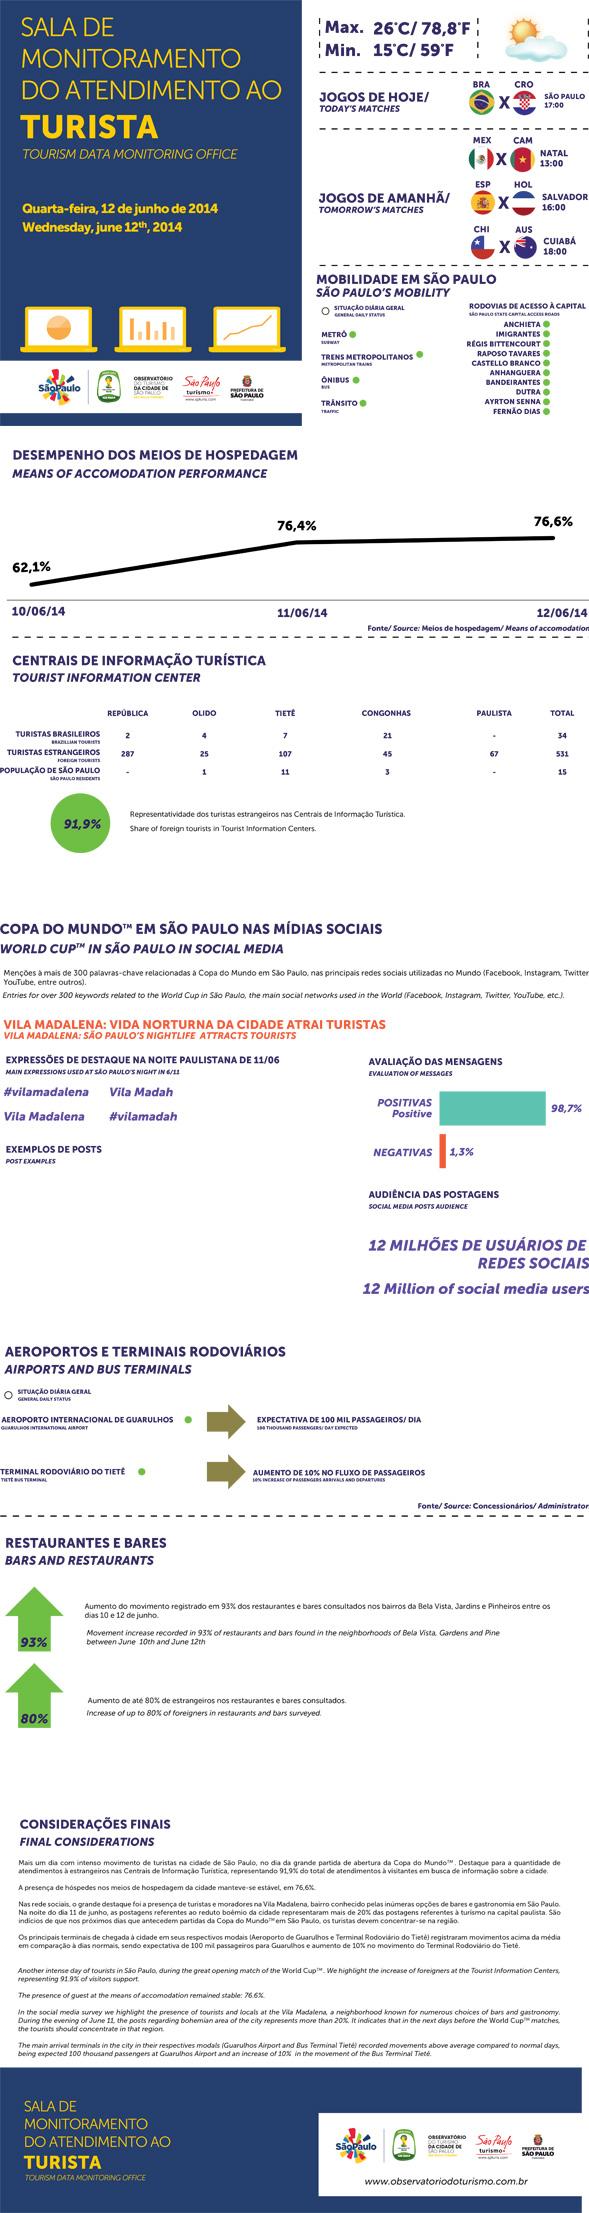 relatorio-12-06